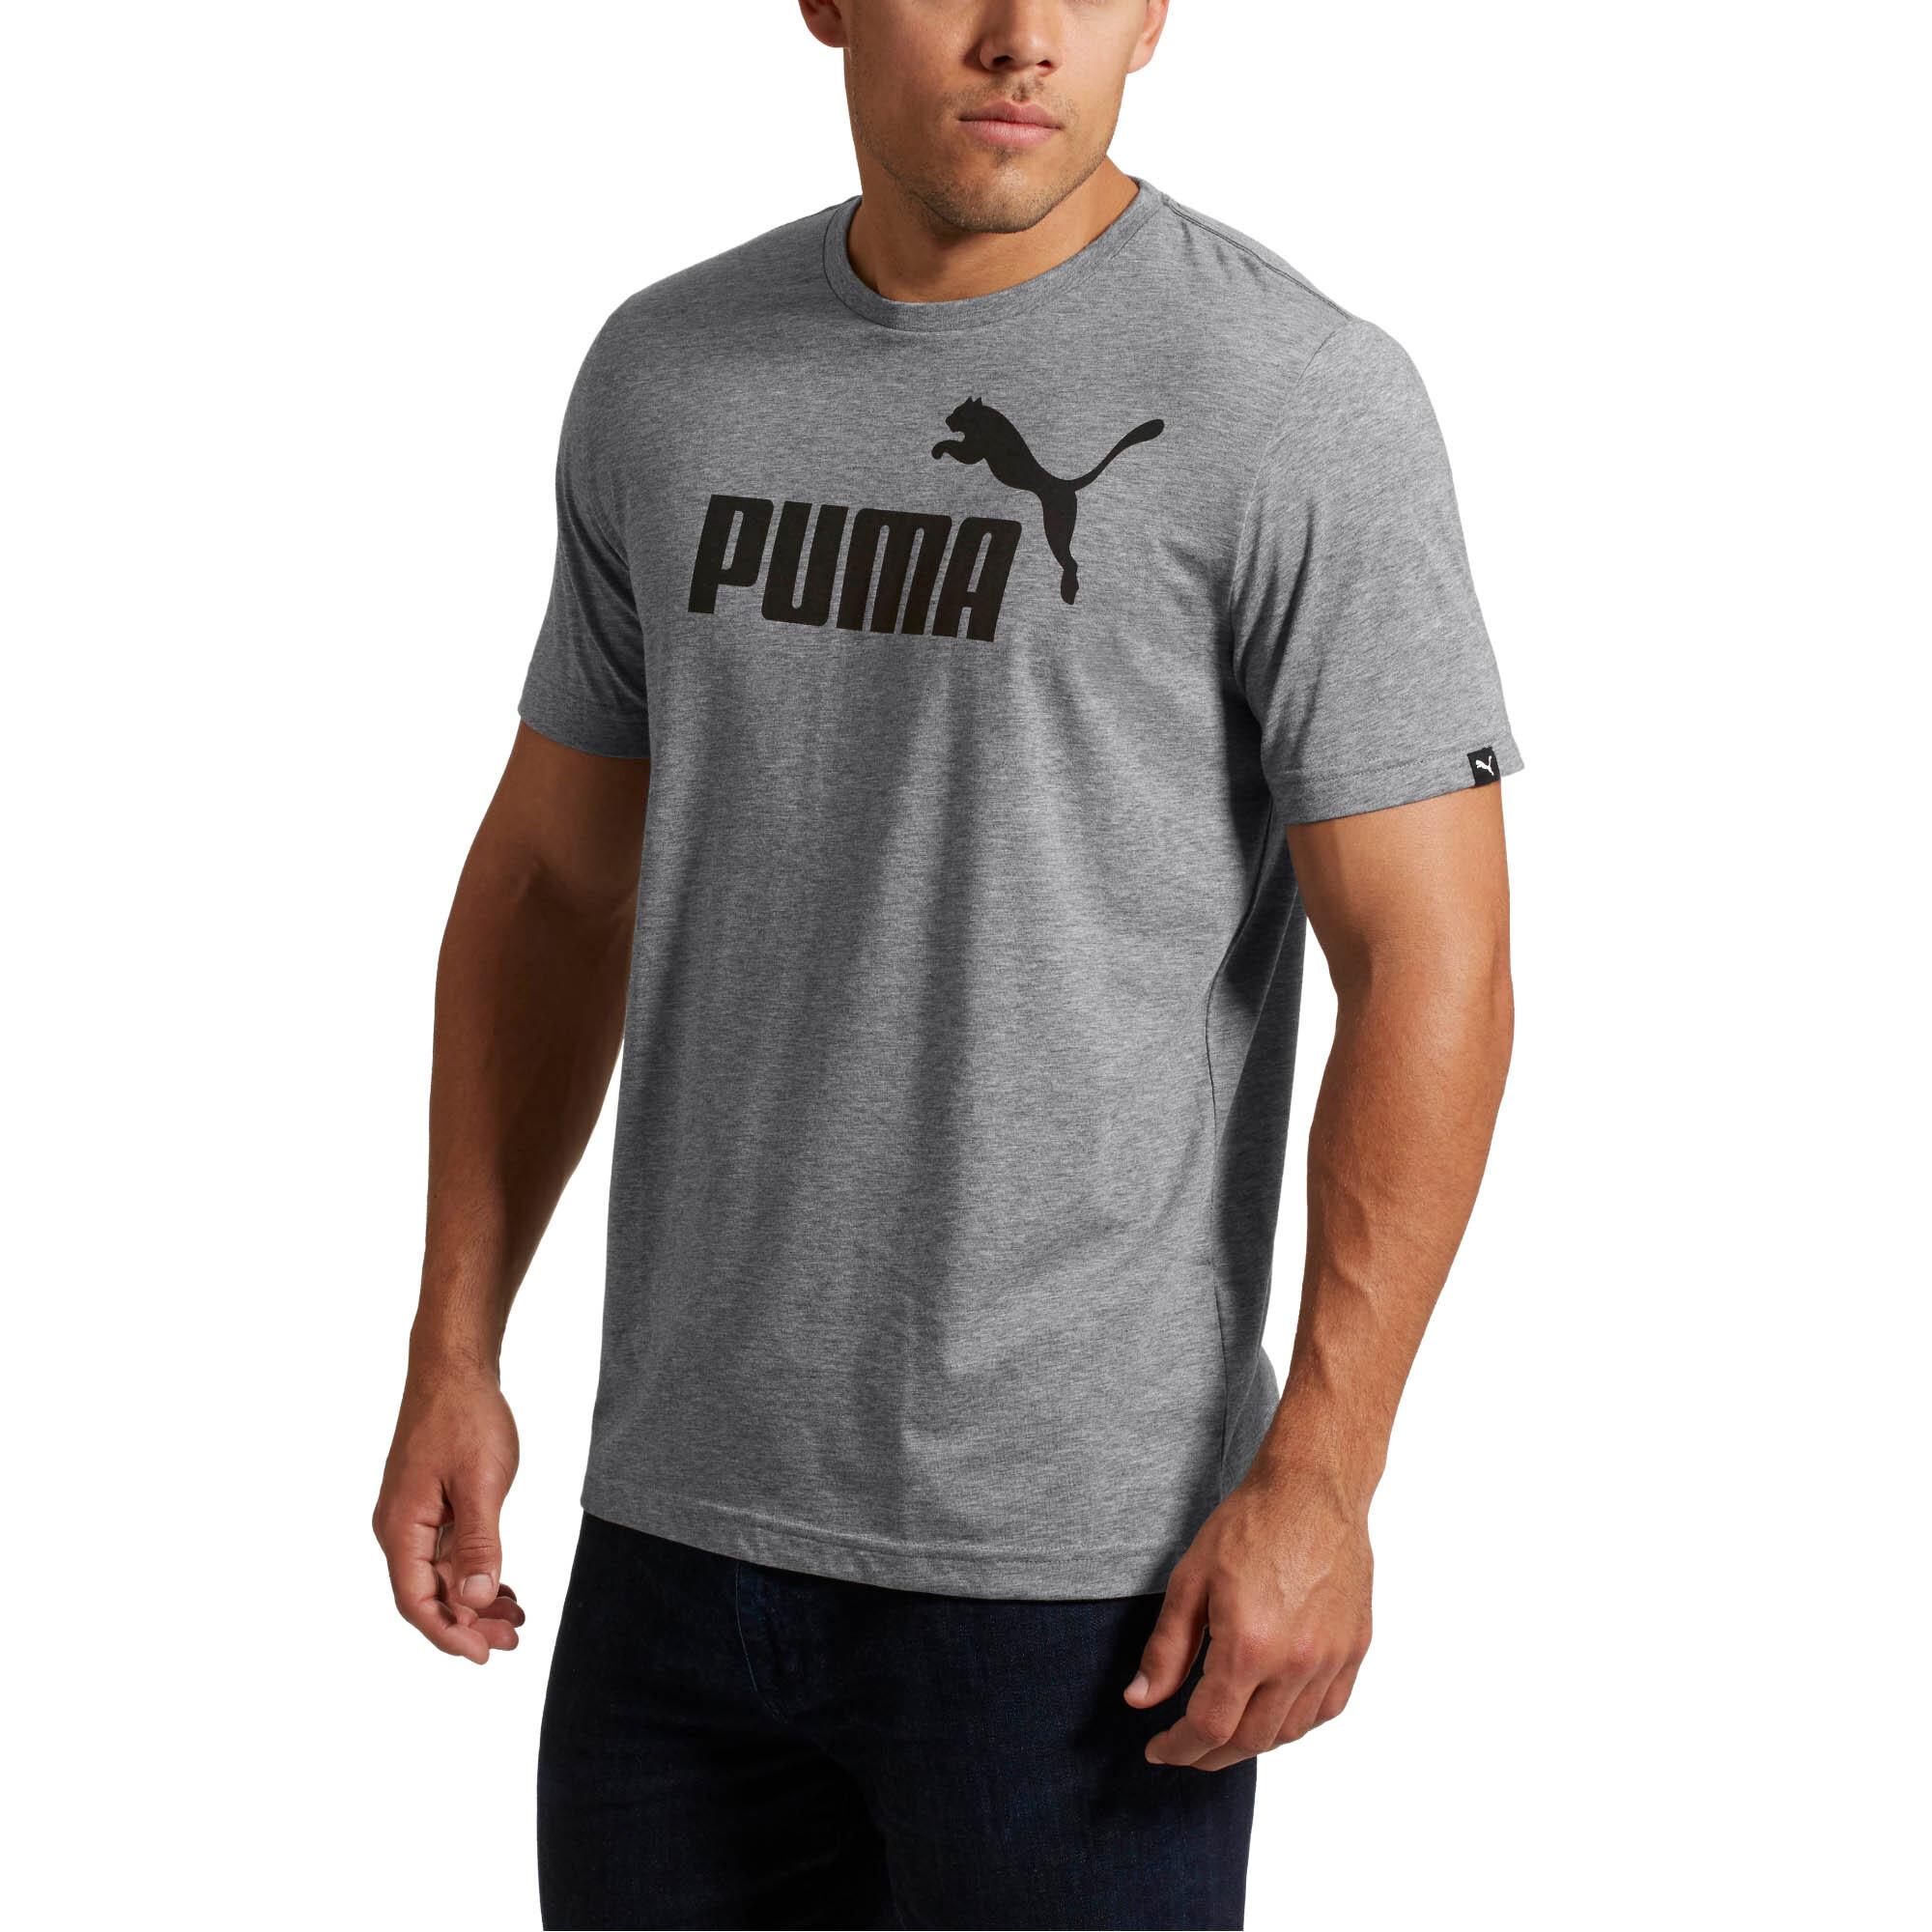 ca1a8c2e4 PUMA No. 1 Heather T-Shirt Men Tee Basics | eBay